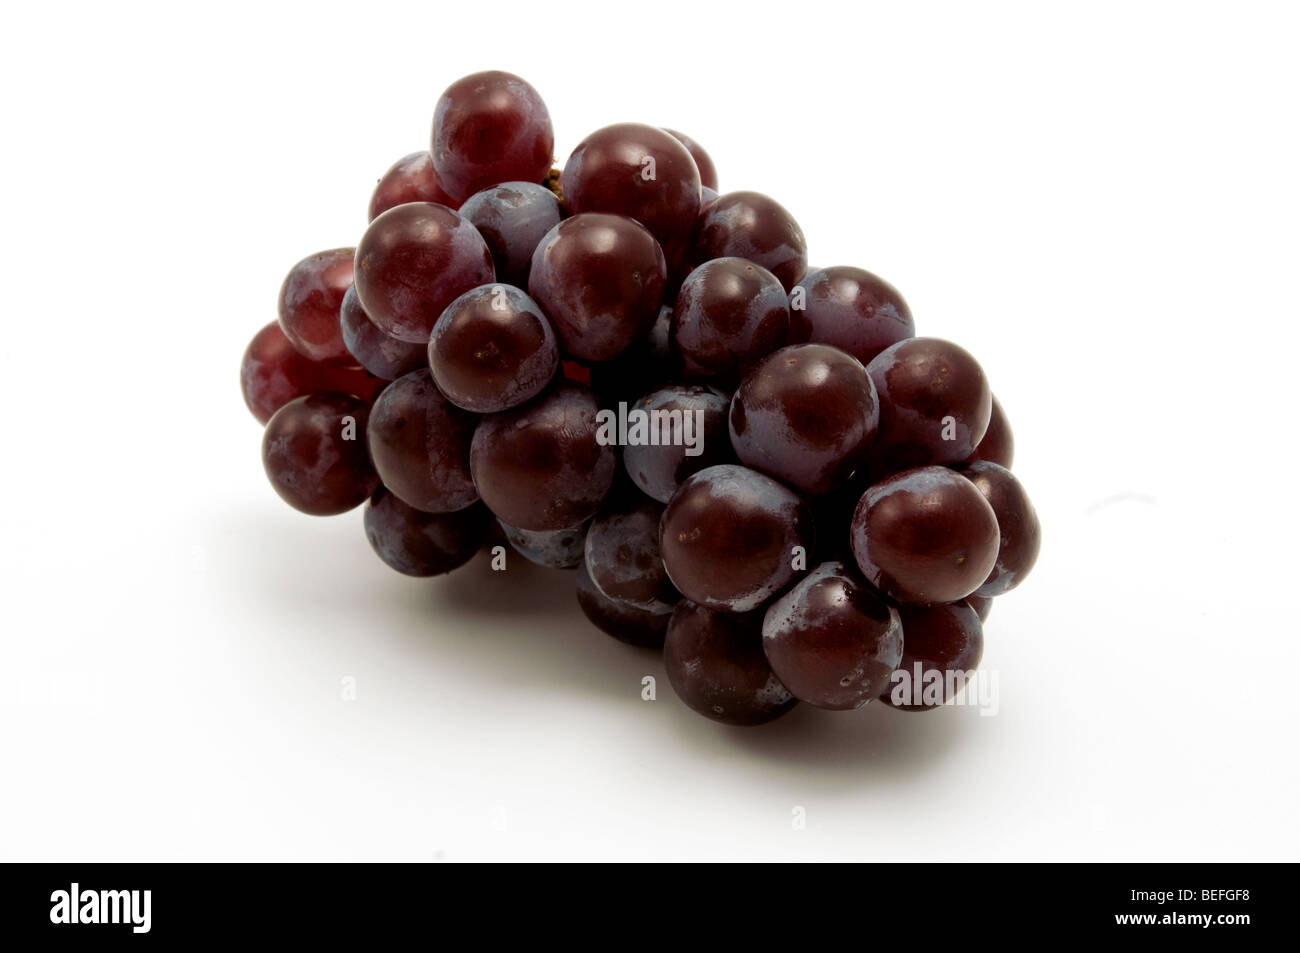 Isabella grape on a white background Stock Photo